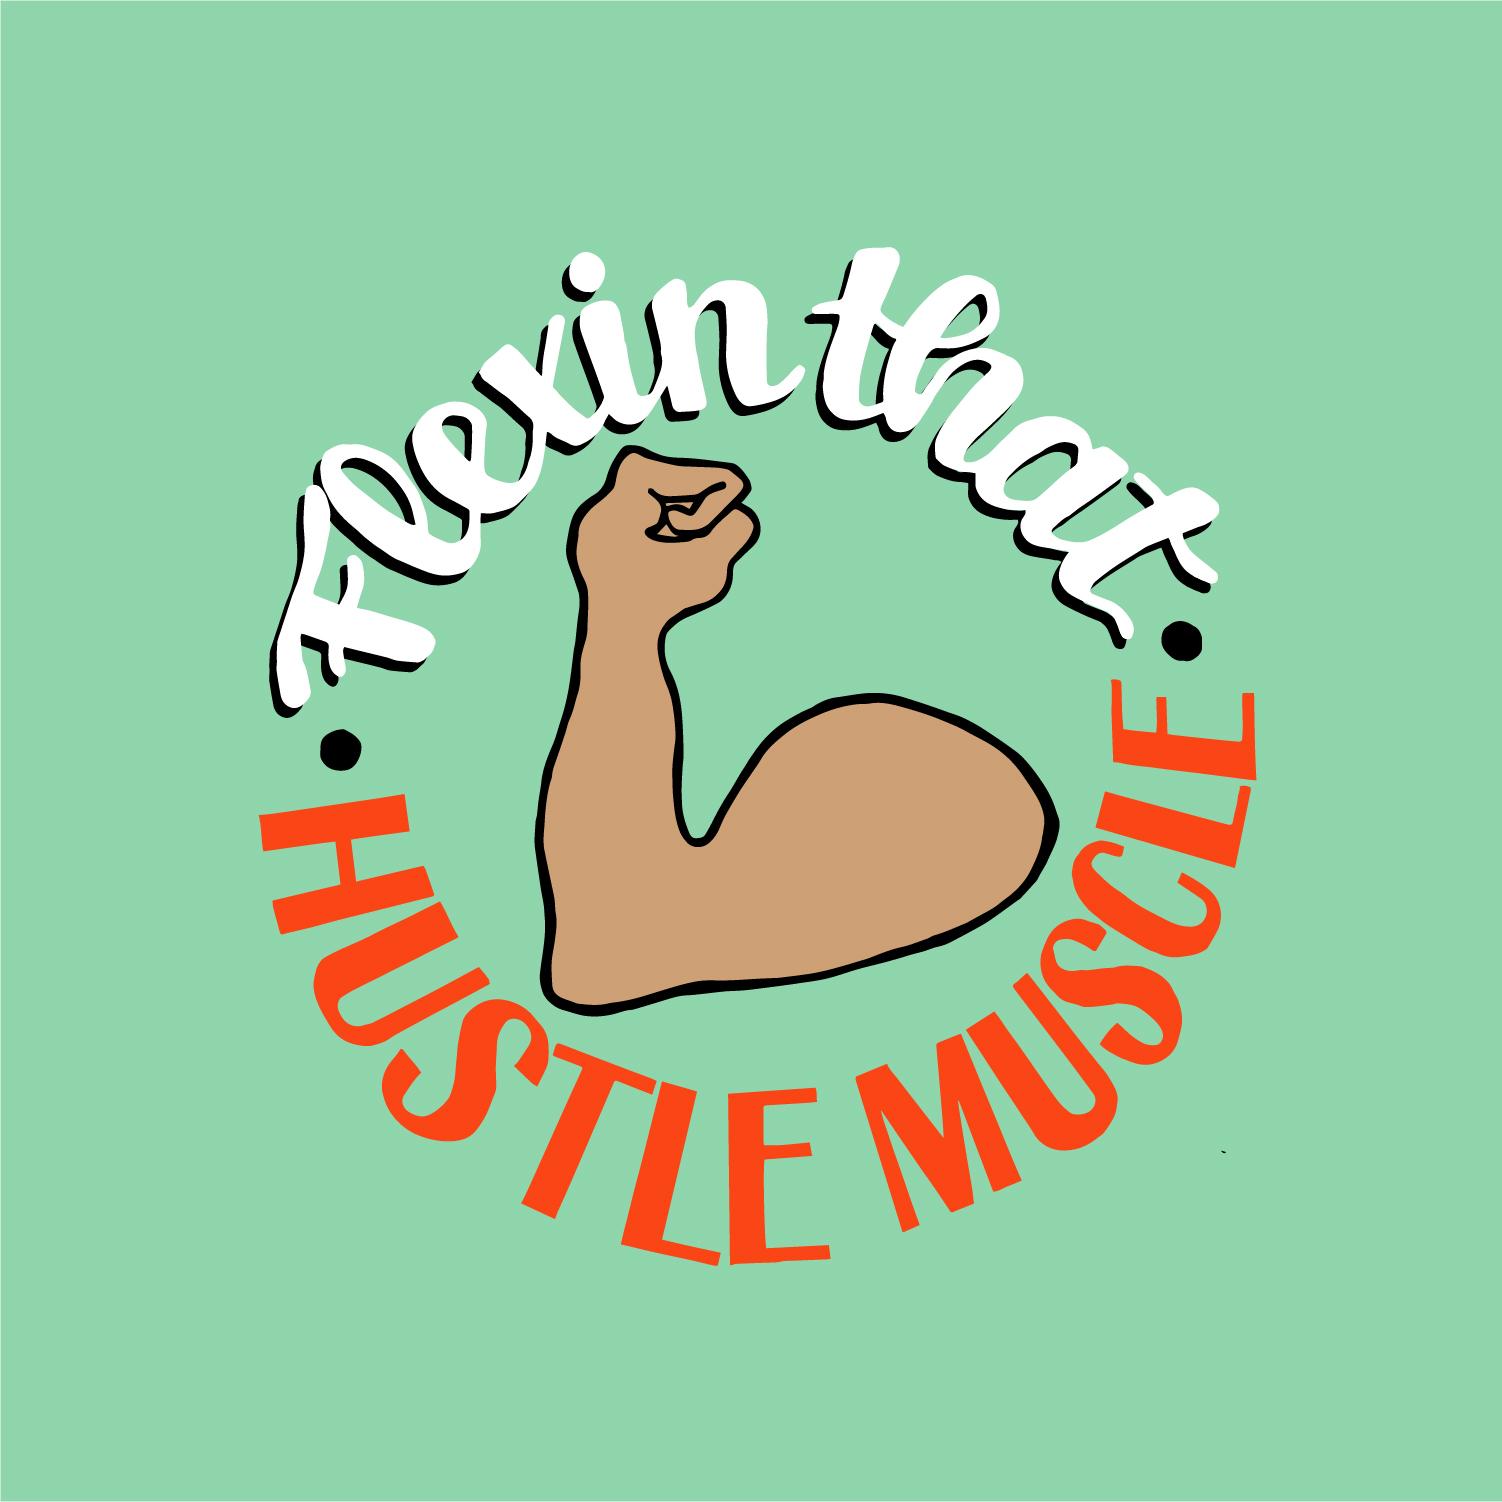 IllustrationImages_Hustle Muscle.jpg